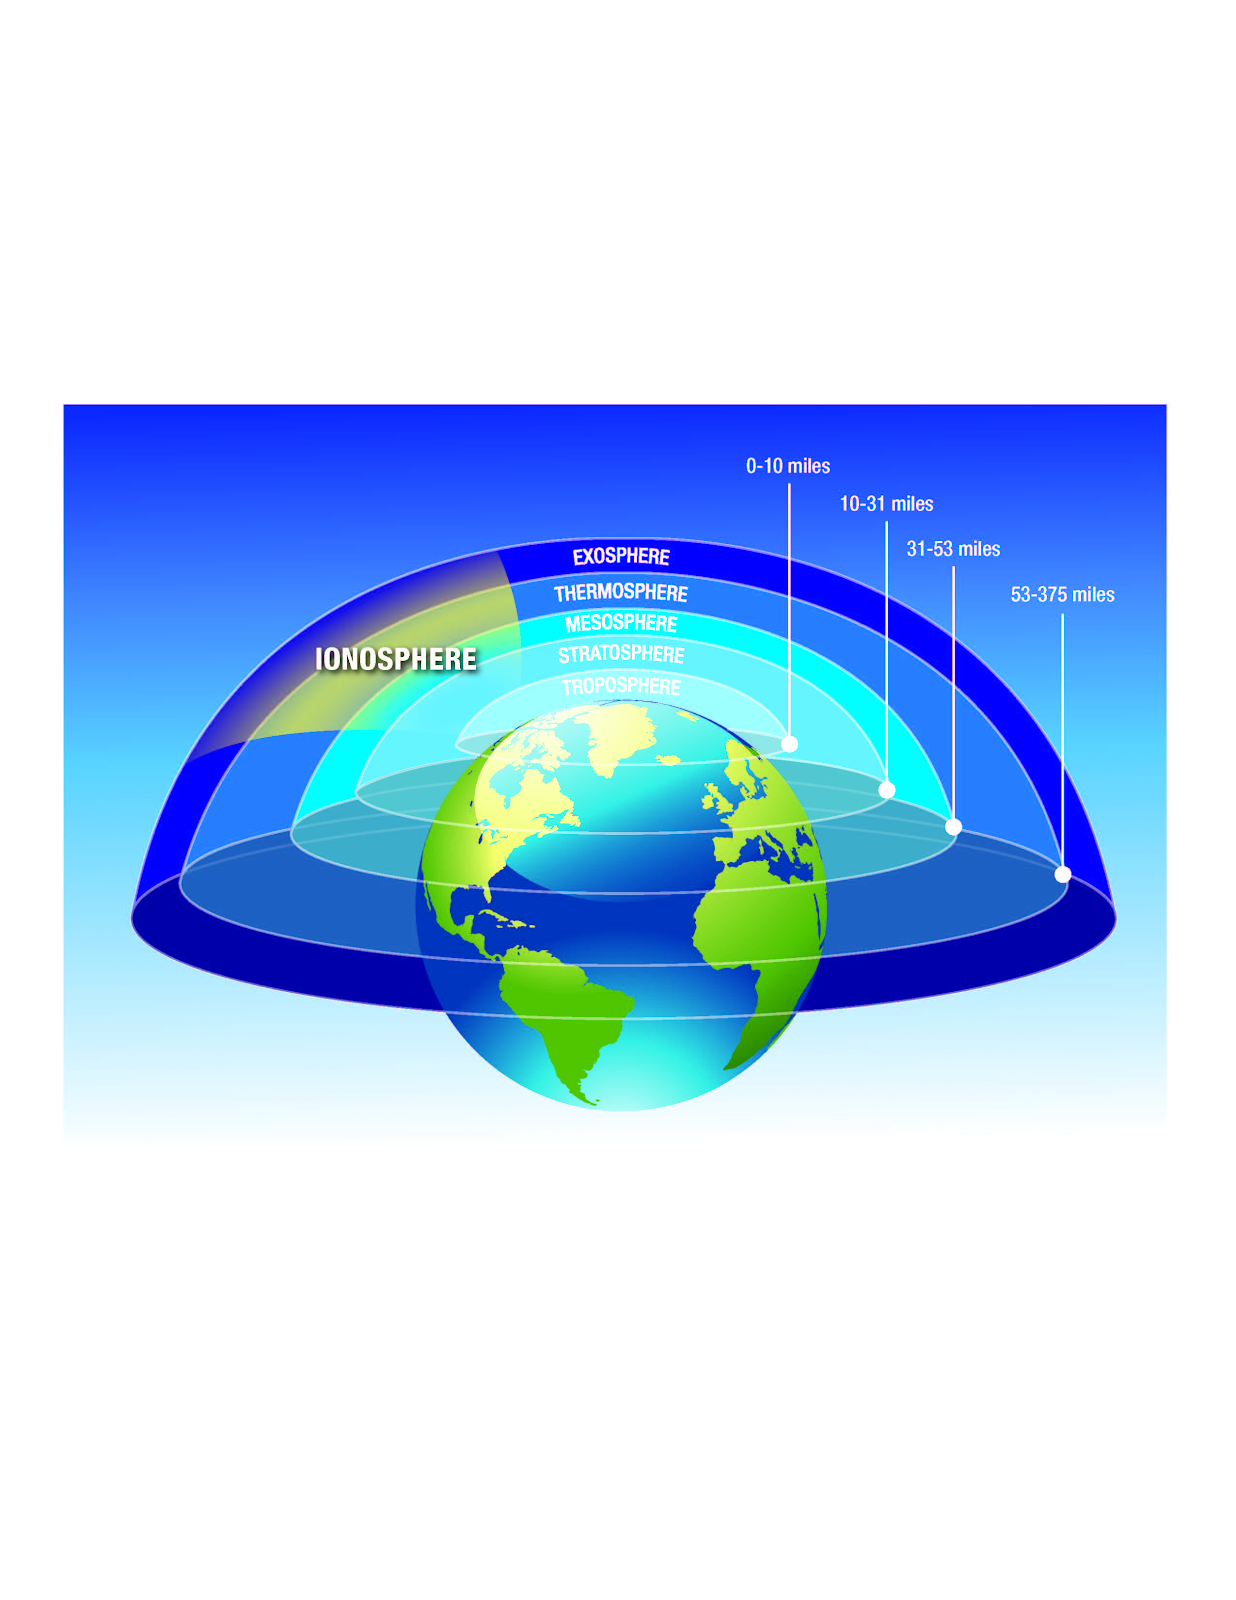 ionospheric-irregularities-that-influence-communication-navigation-systems-summary